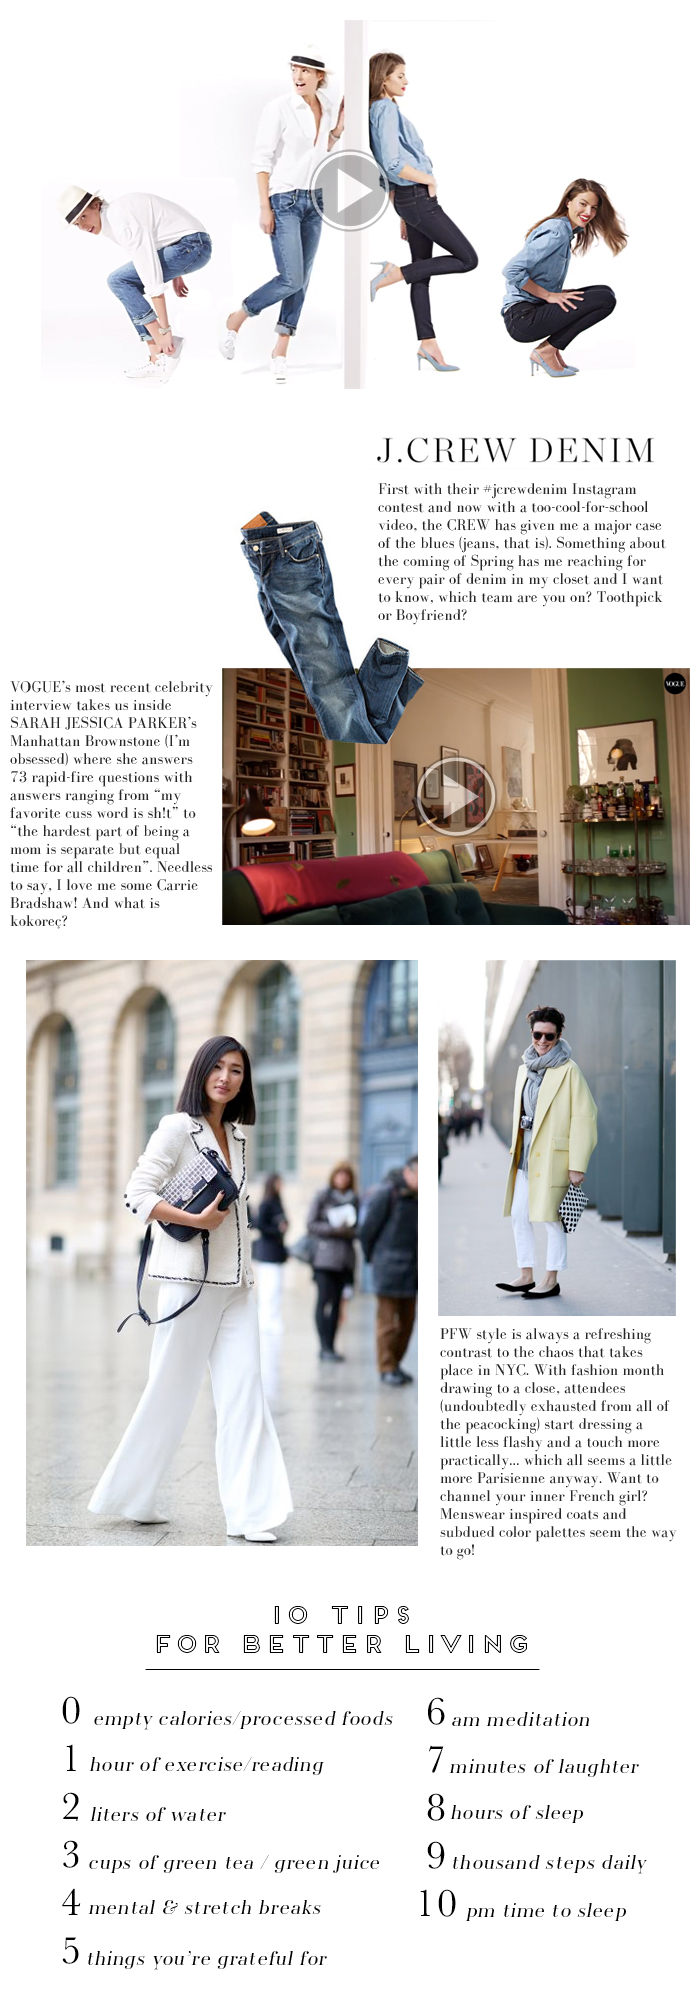 happy-friday-sarah-jessica-parker-vogue-j.crew-denim-paris-fashion-week